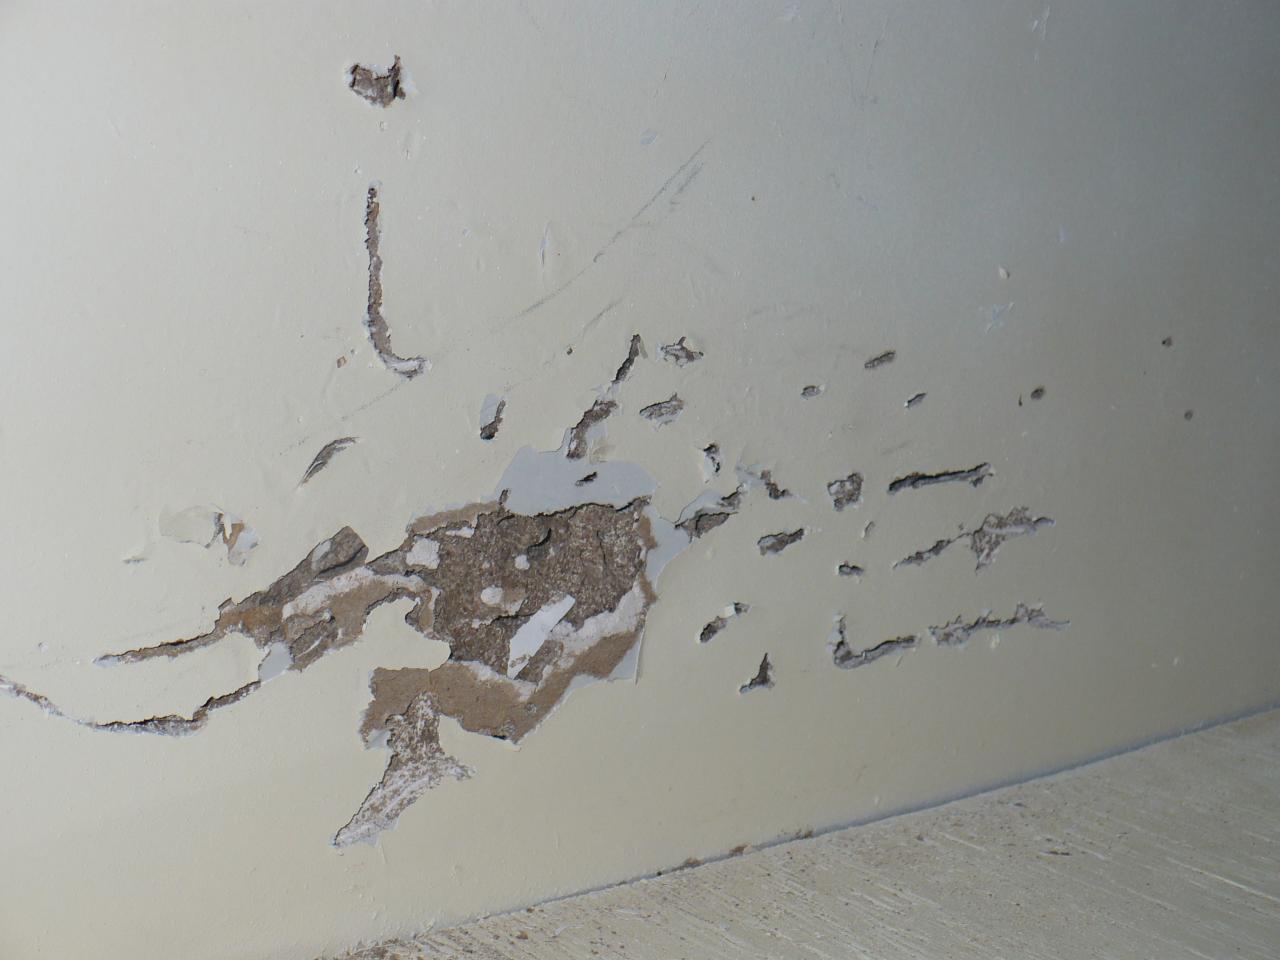 Sheet Rock Damaged by Termites